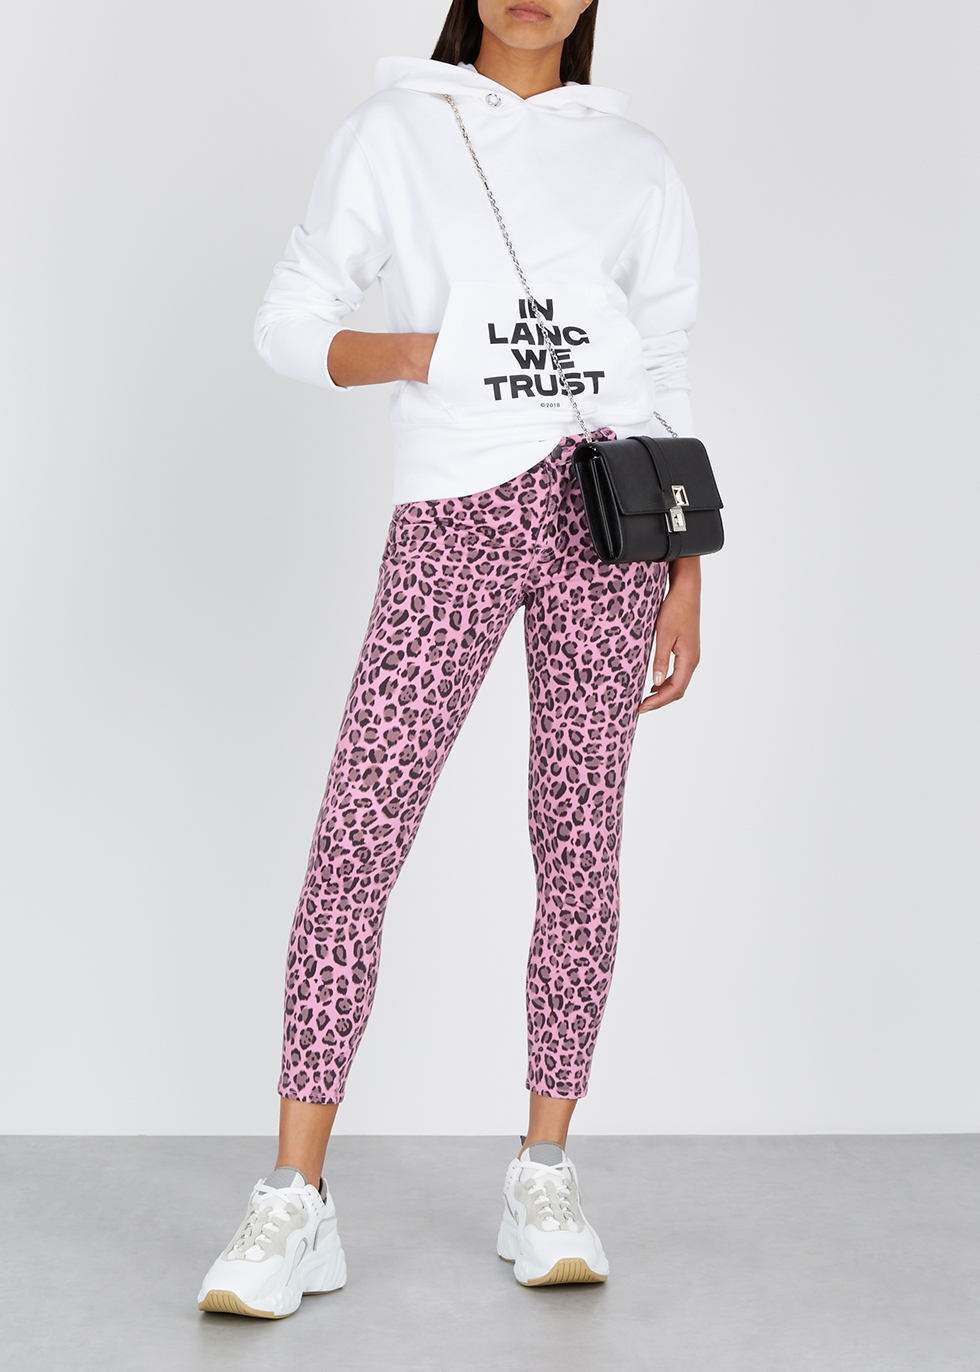 Leopard-print cropped skinny jeans - J Brand